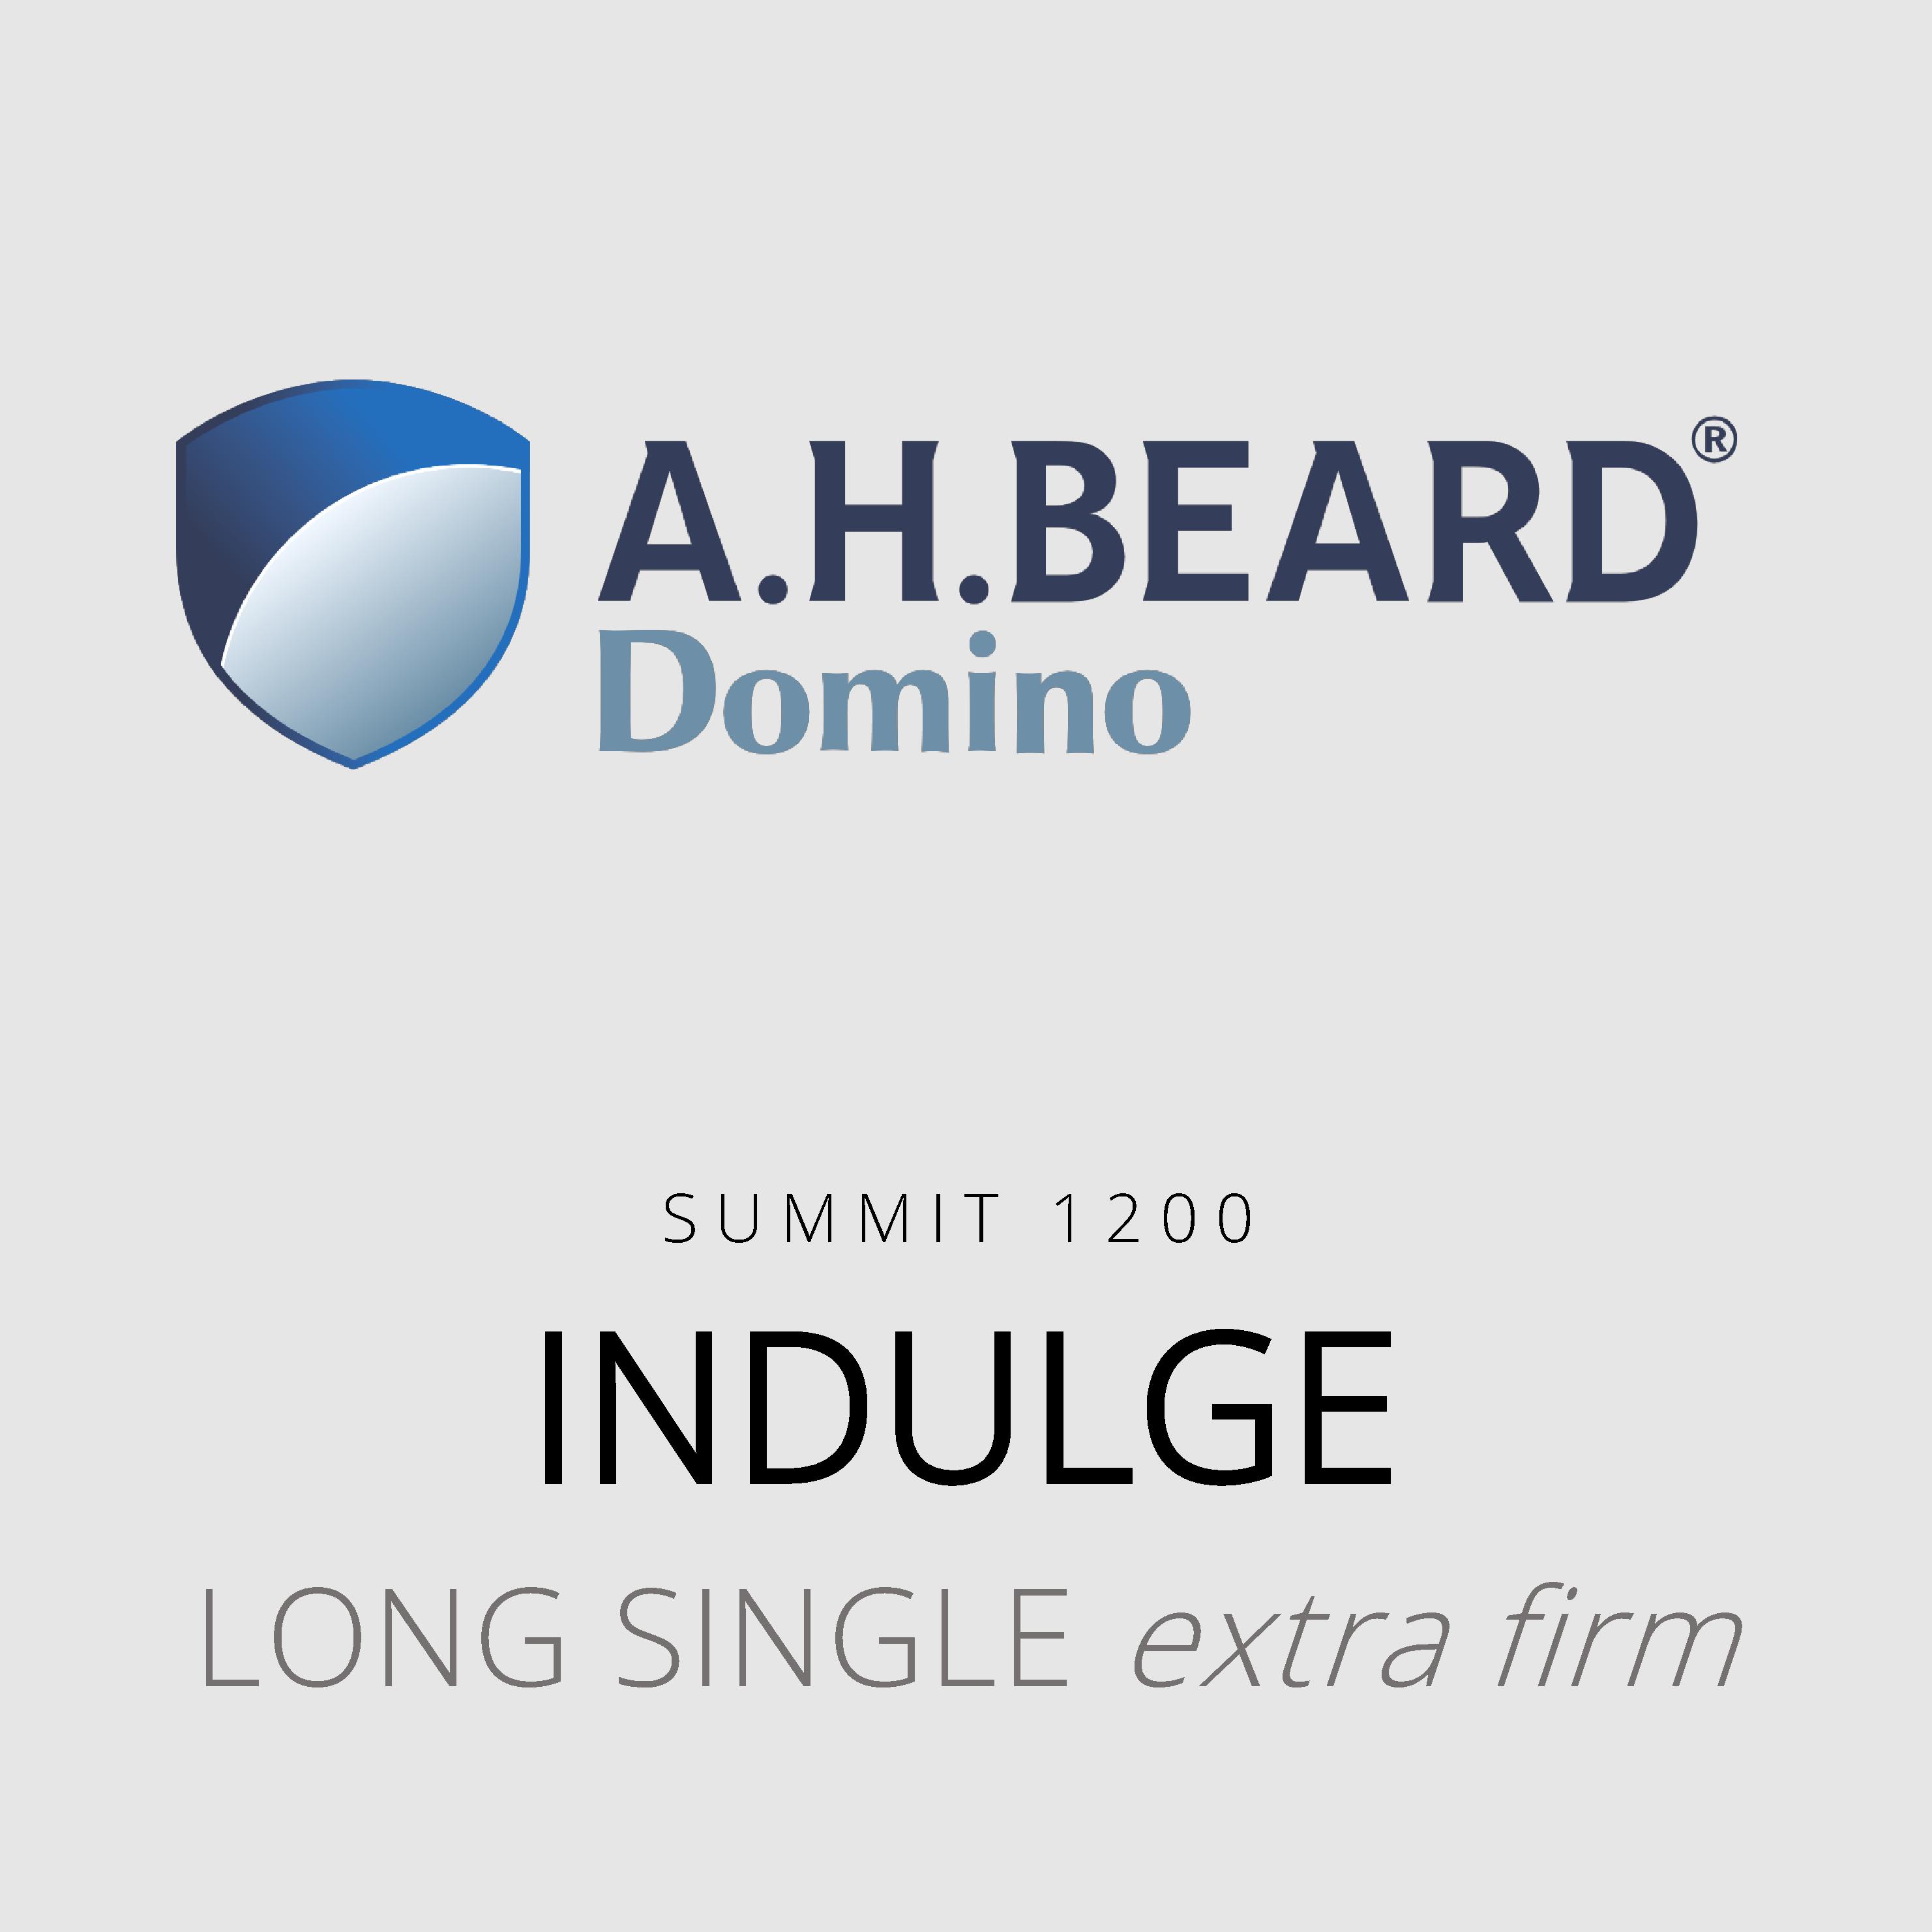 AH Beard Domino – Indulge – Summit 1200 – Long Single Extra Firm Mattress